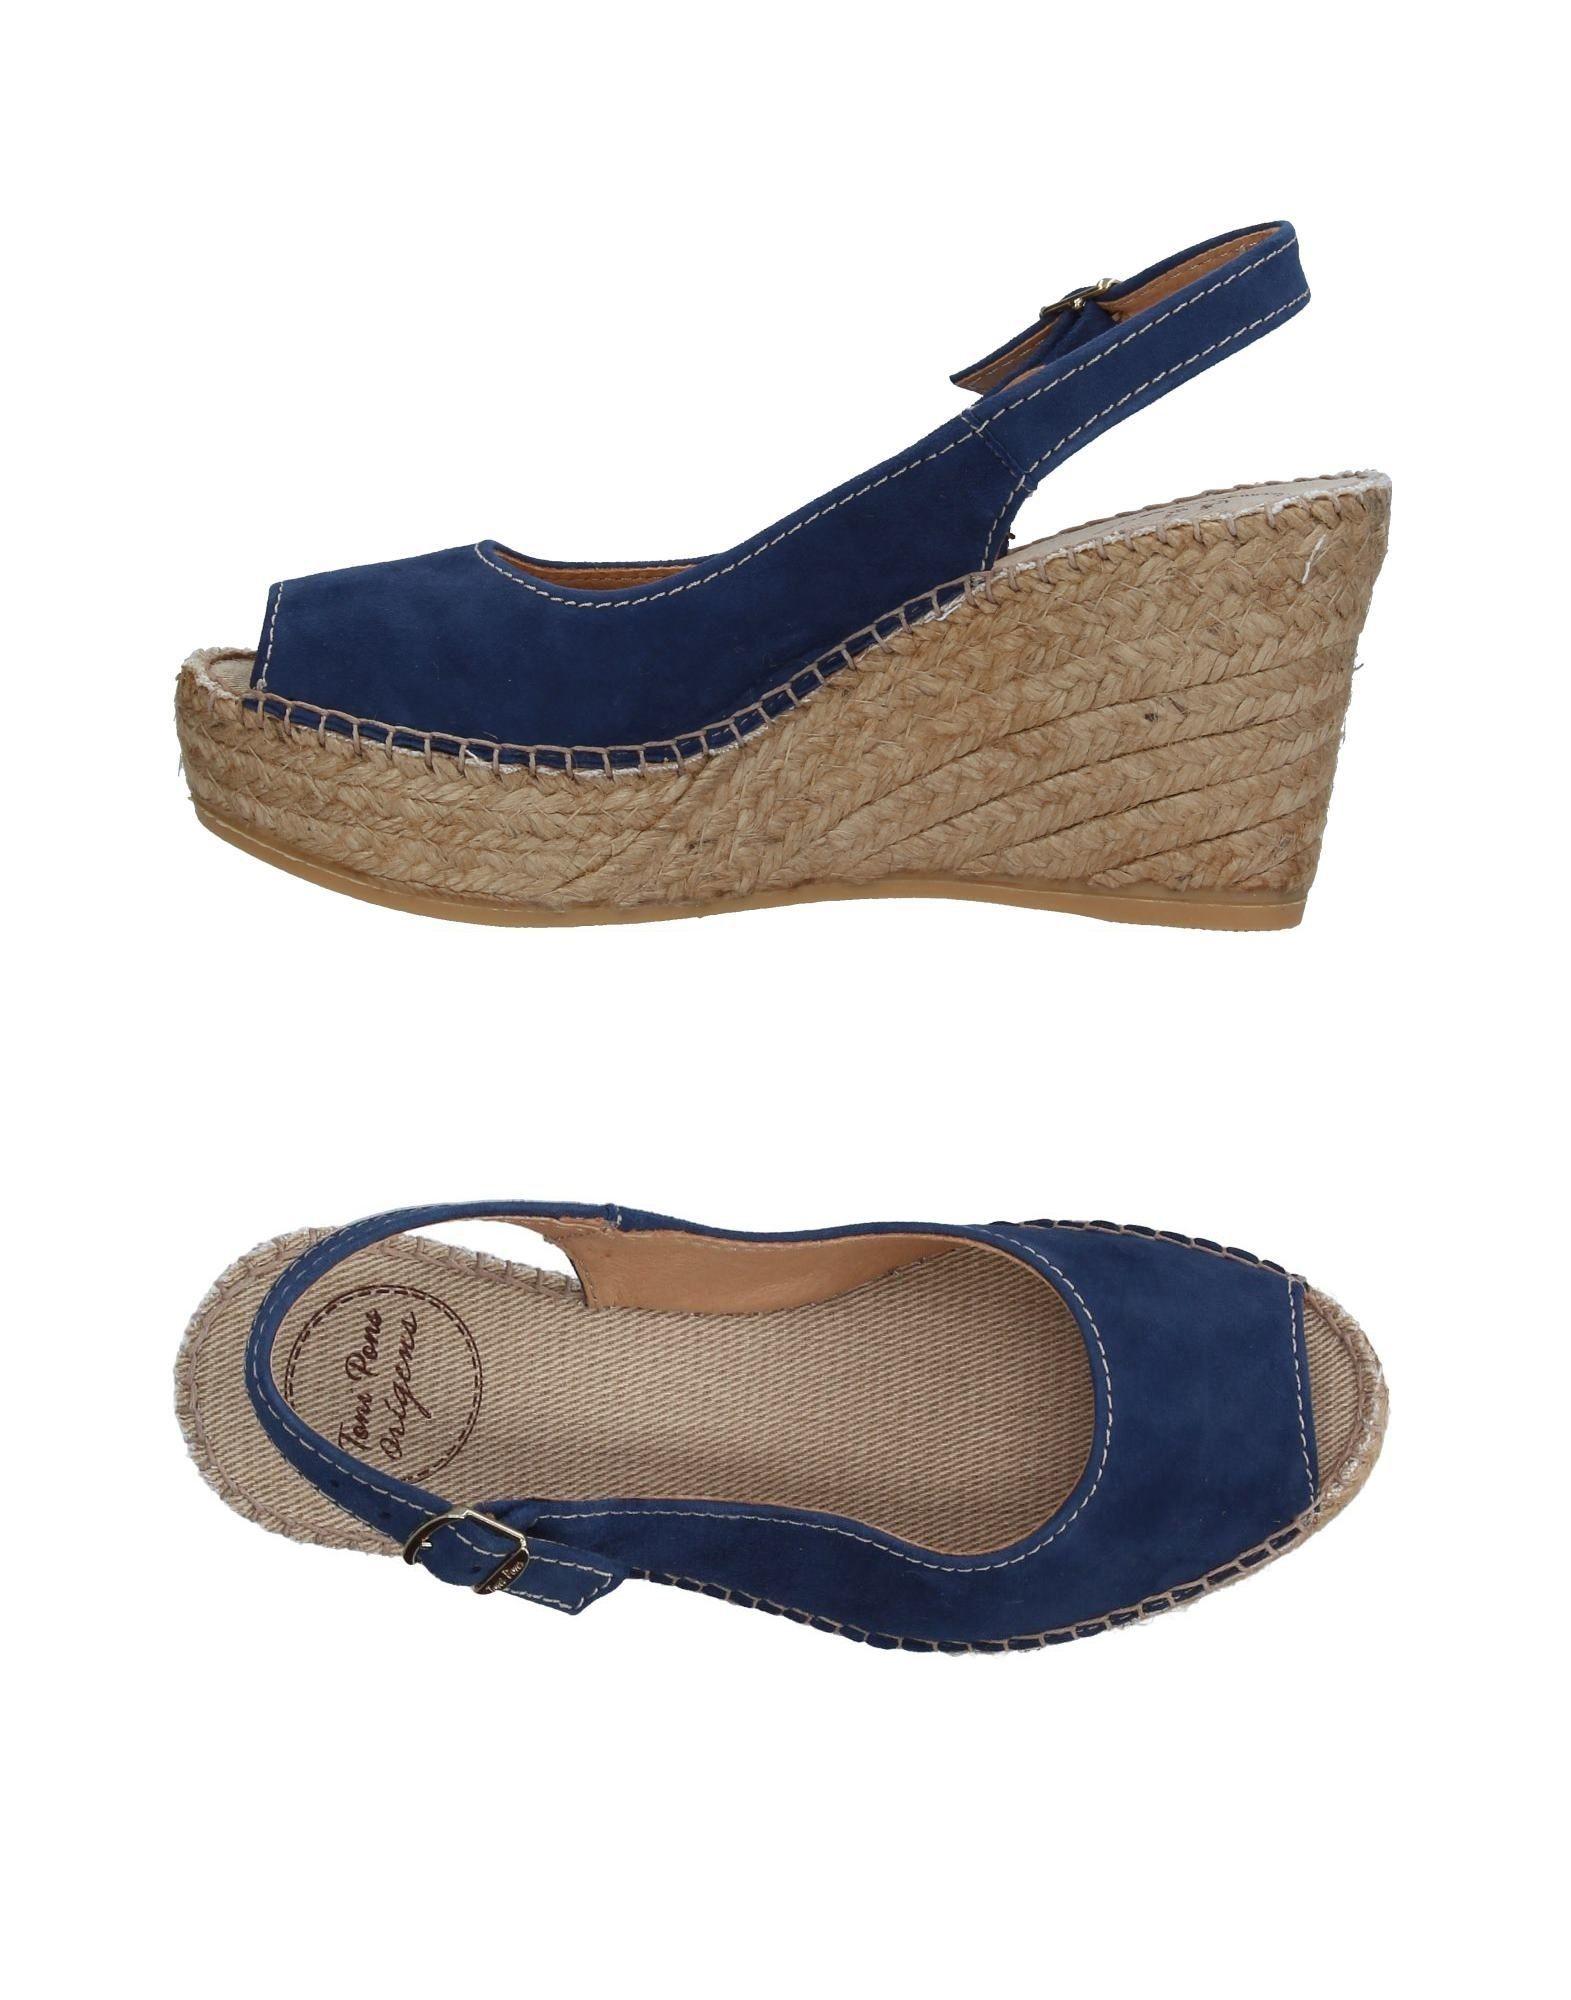 Toni Pons Espadrilles Damen  11375427OS Gute Qualität beliebte Schuhe